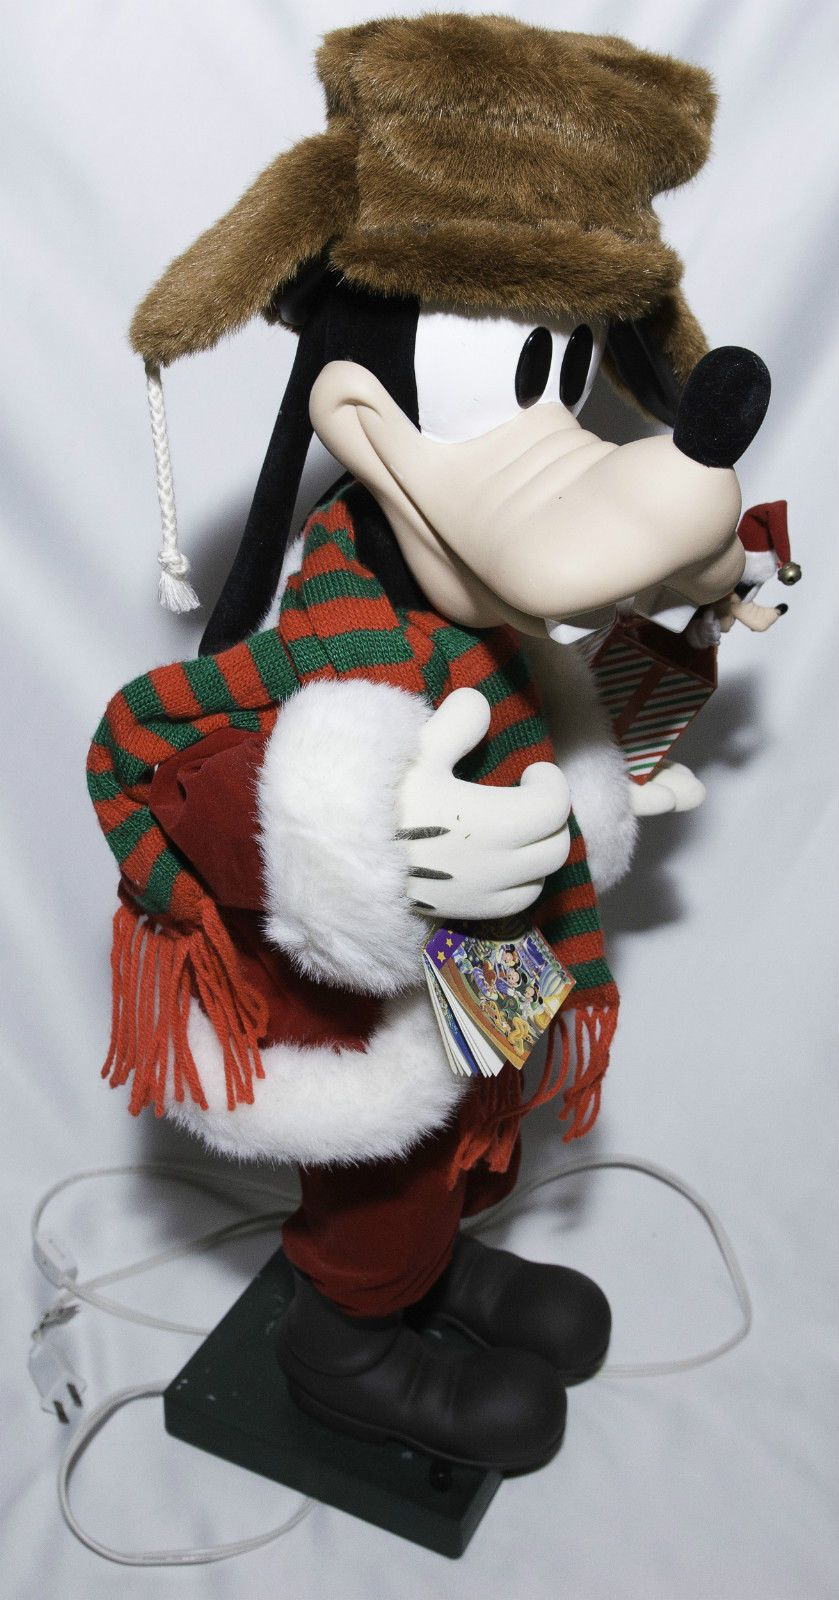 Disney Goofy Animated Christmas Figure It's a Small World